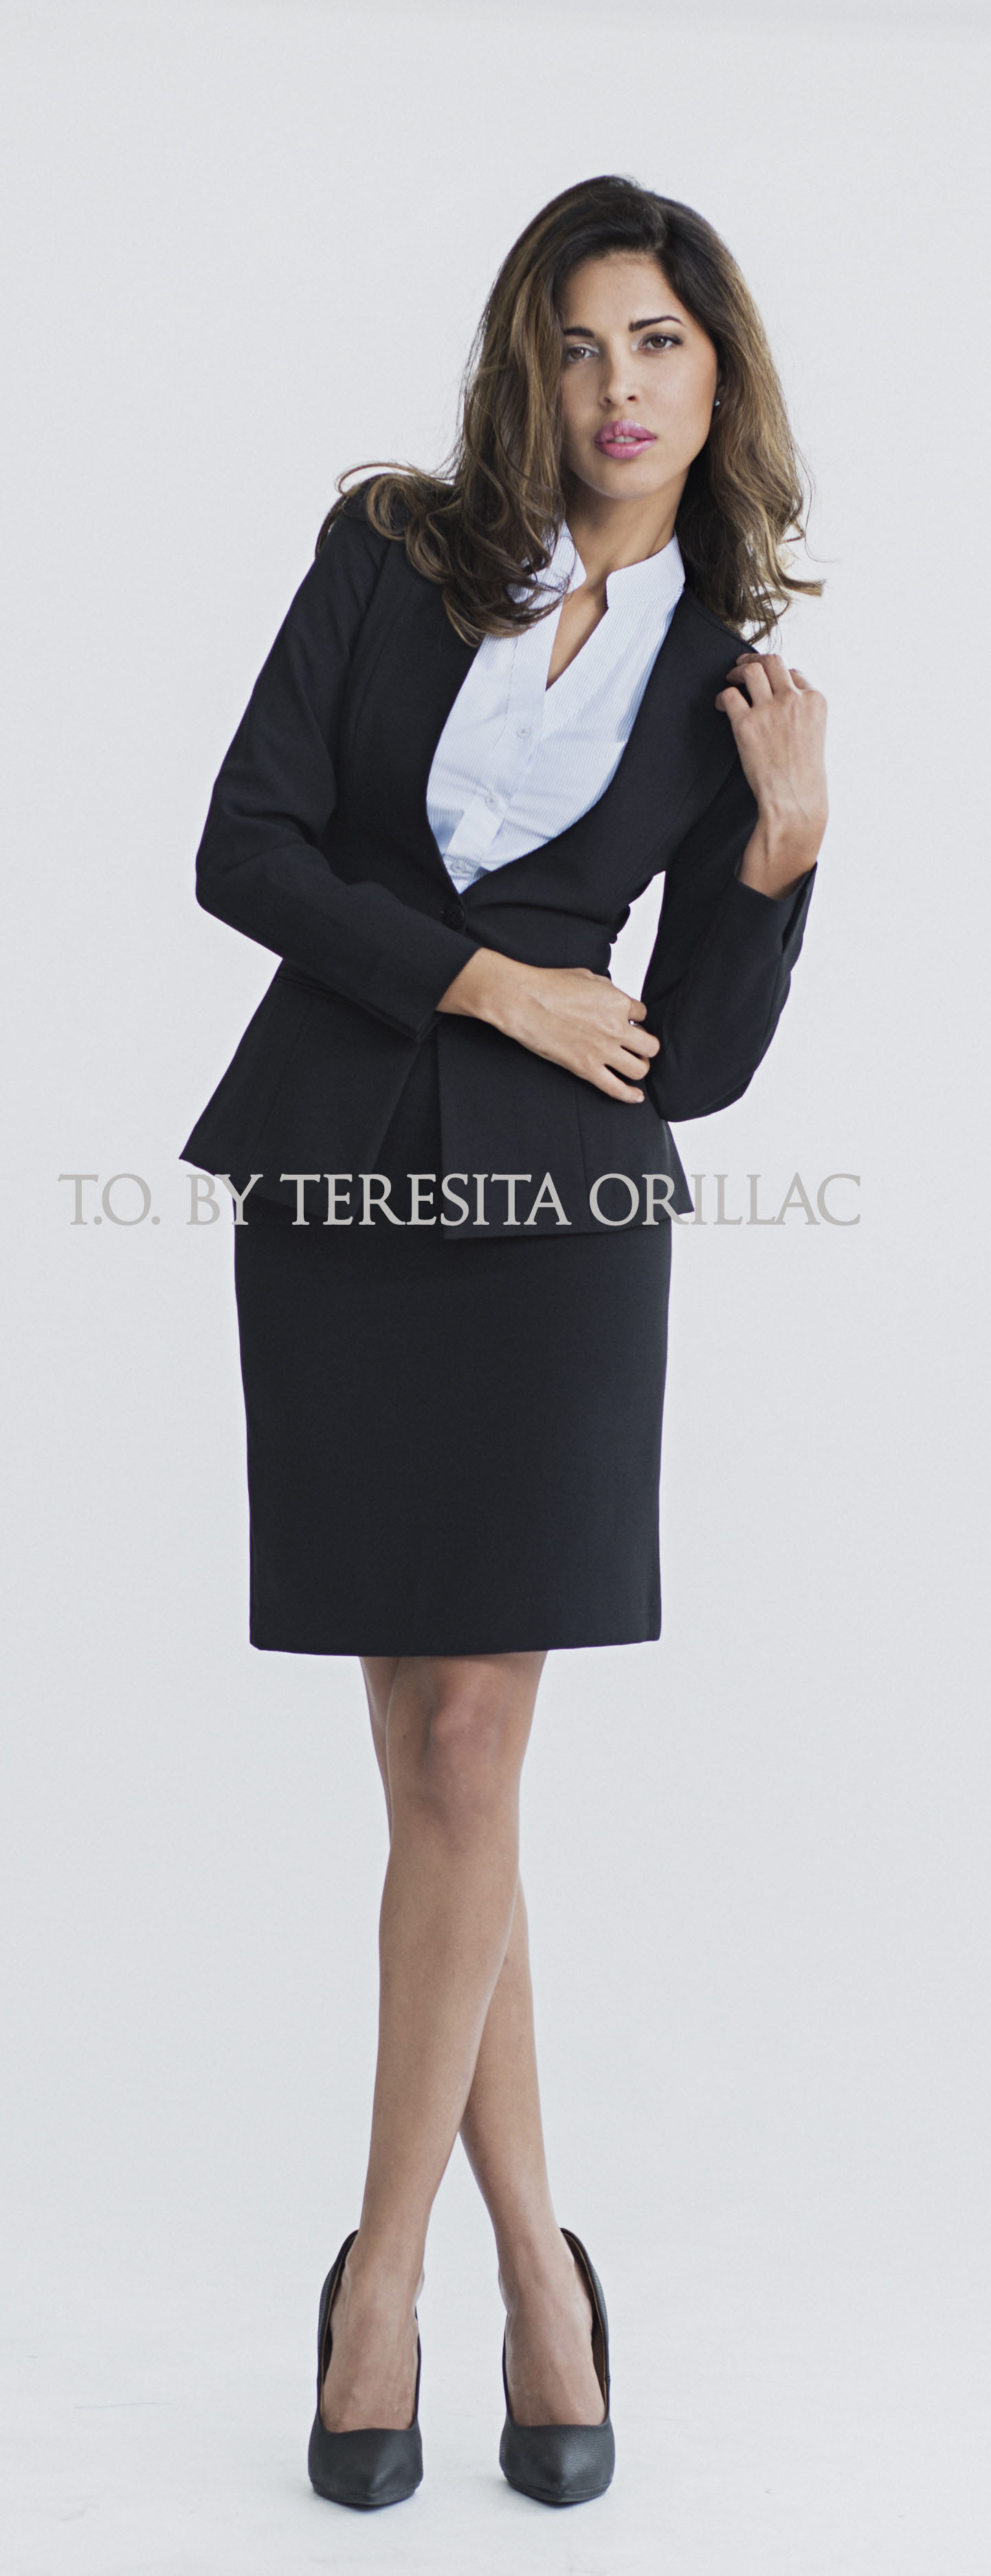 Uniformes panama ropa ejecutiva 1.jpg